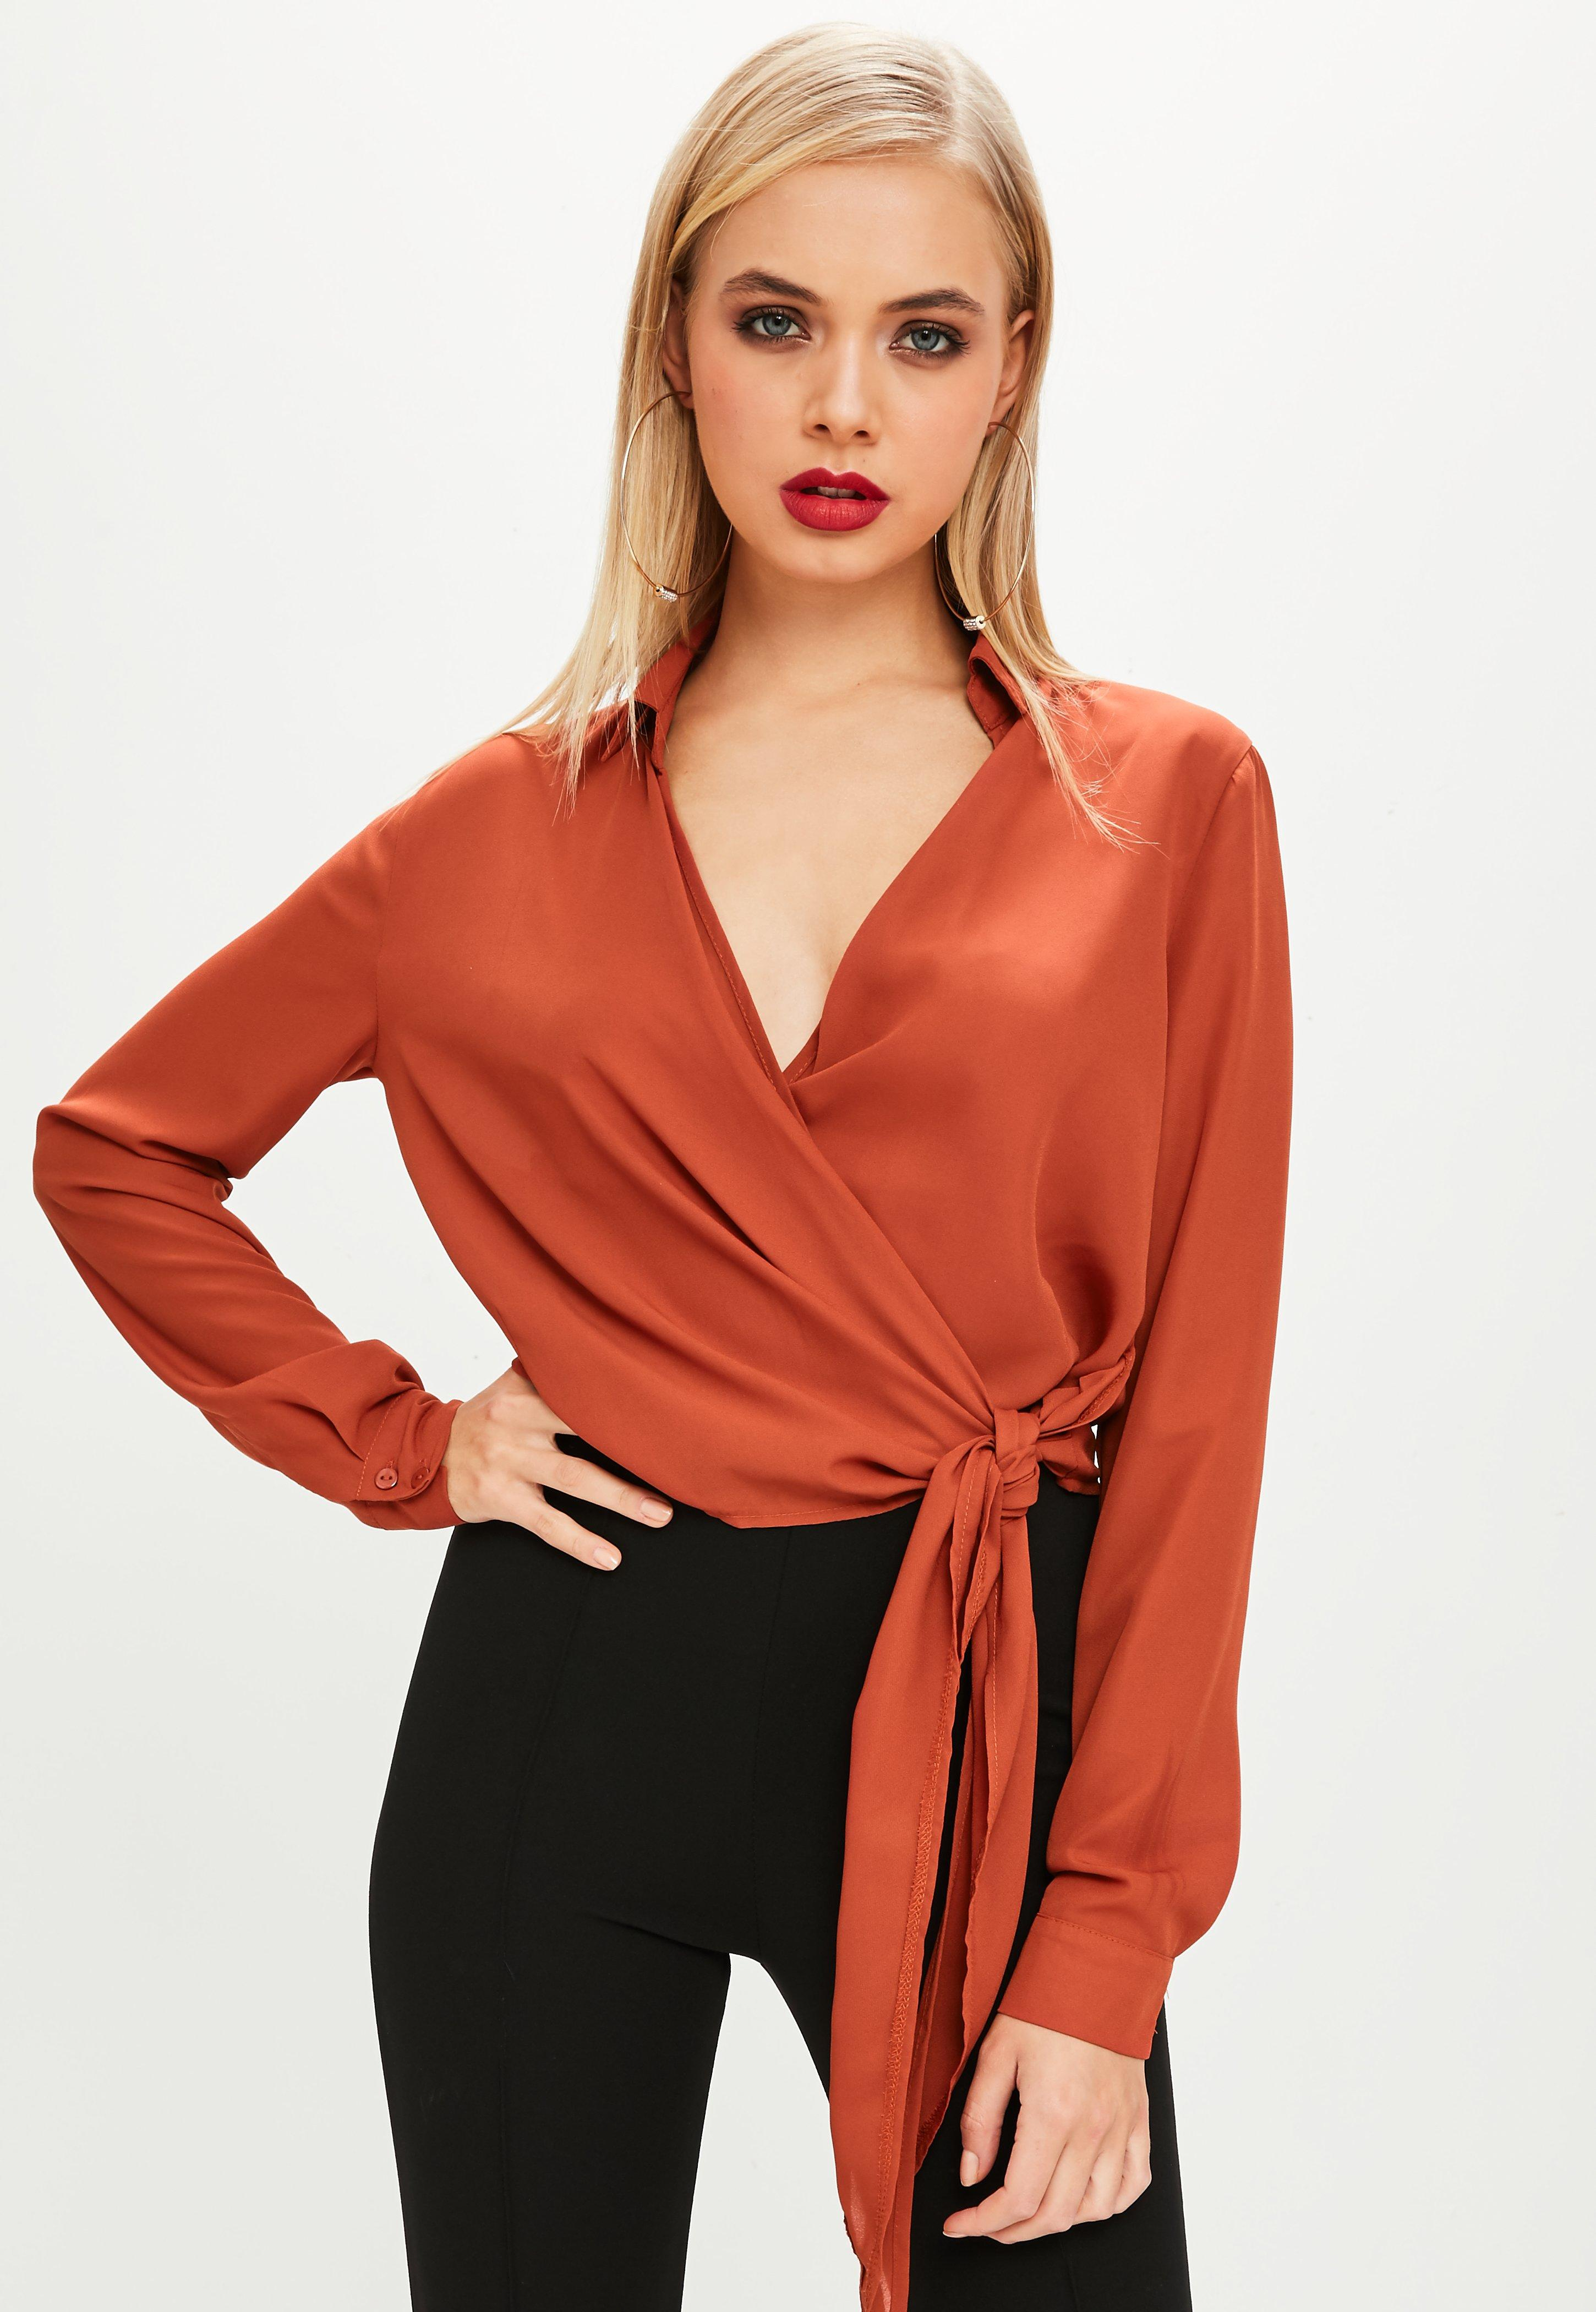 blouses | women's sheer, chiffon & white blouses- missguided